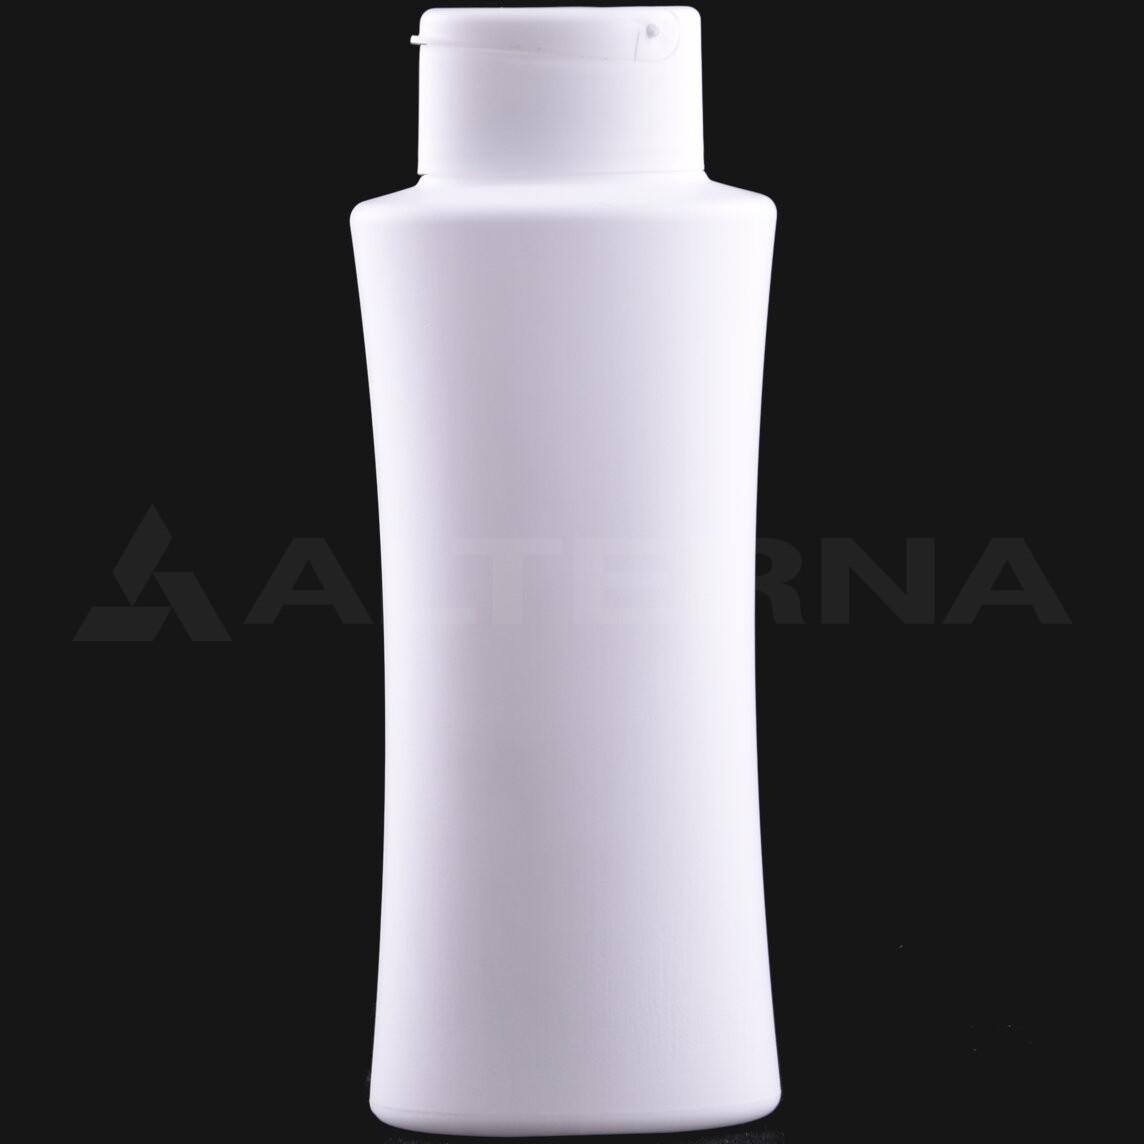 400 ml HDPE Shampoo Bottle with Cap